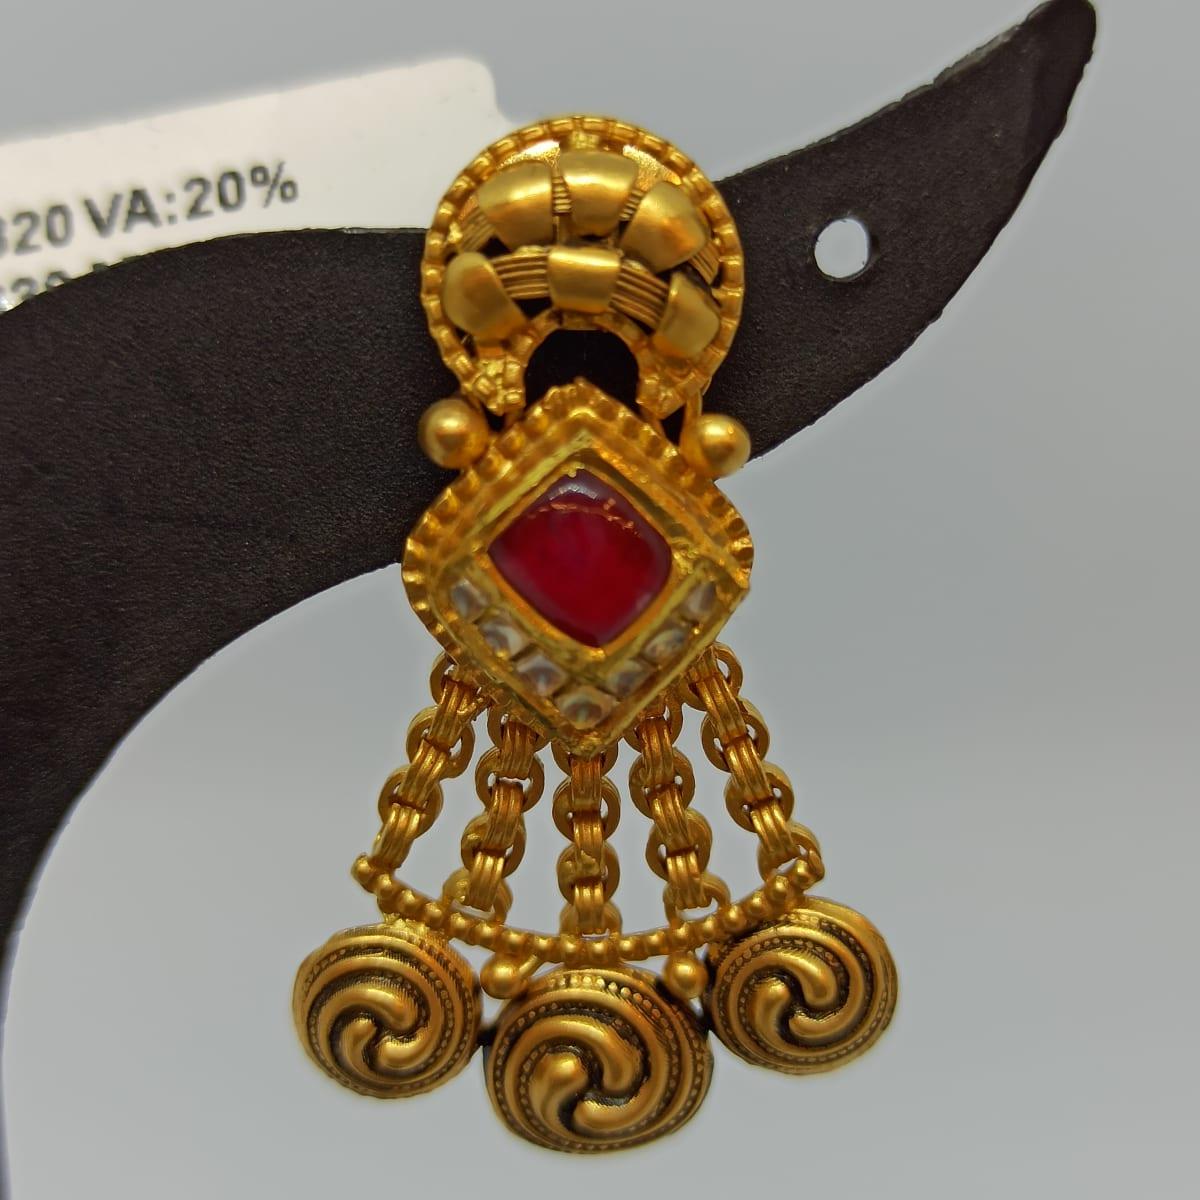 Bali Type Earrings For Her